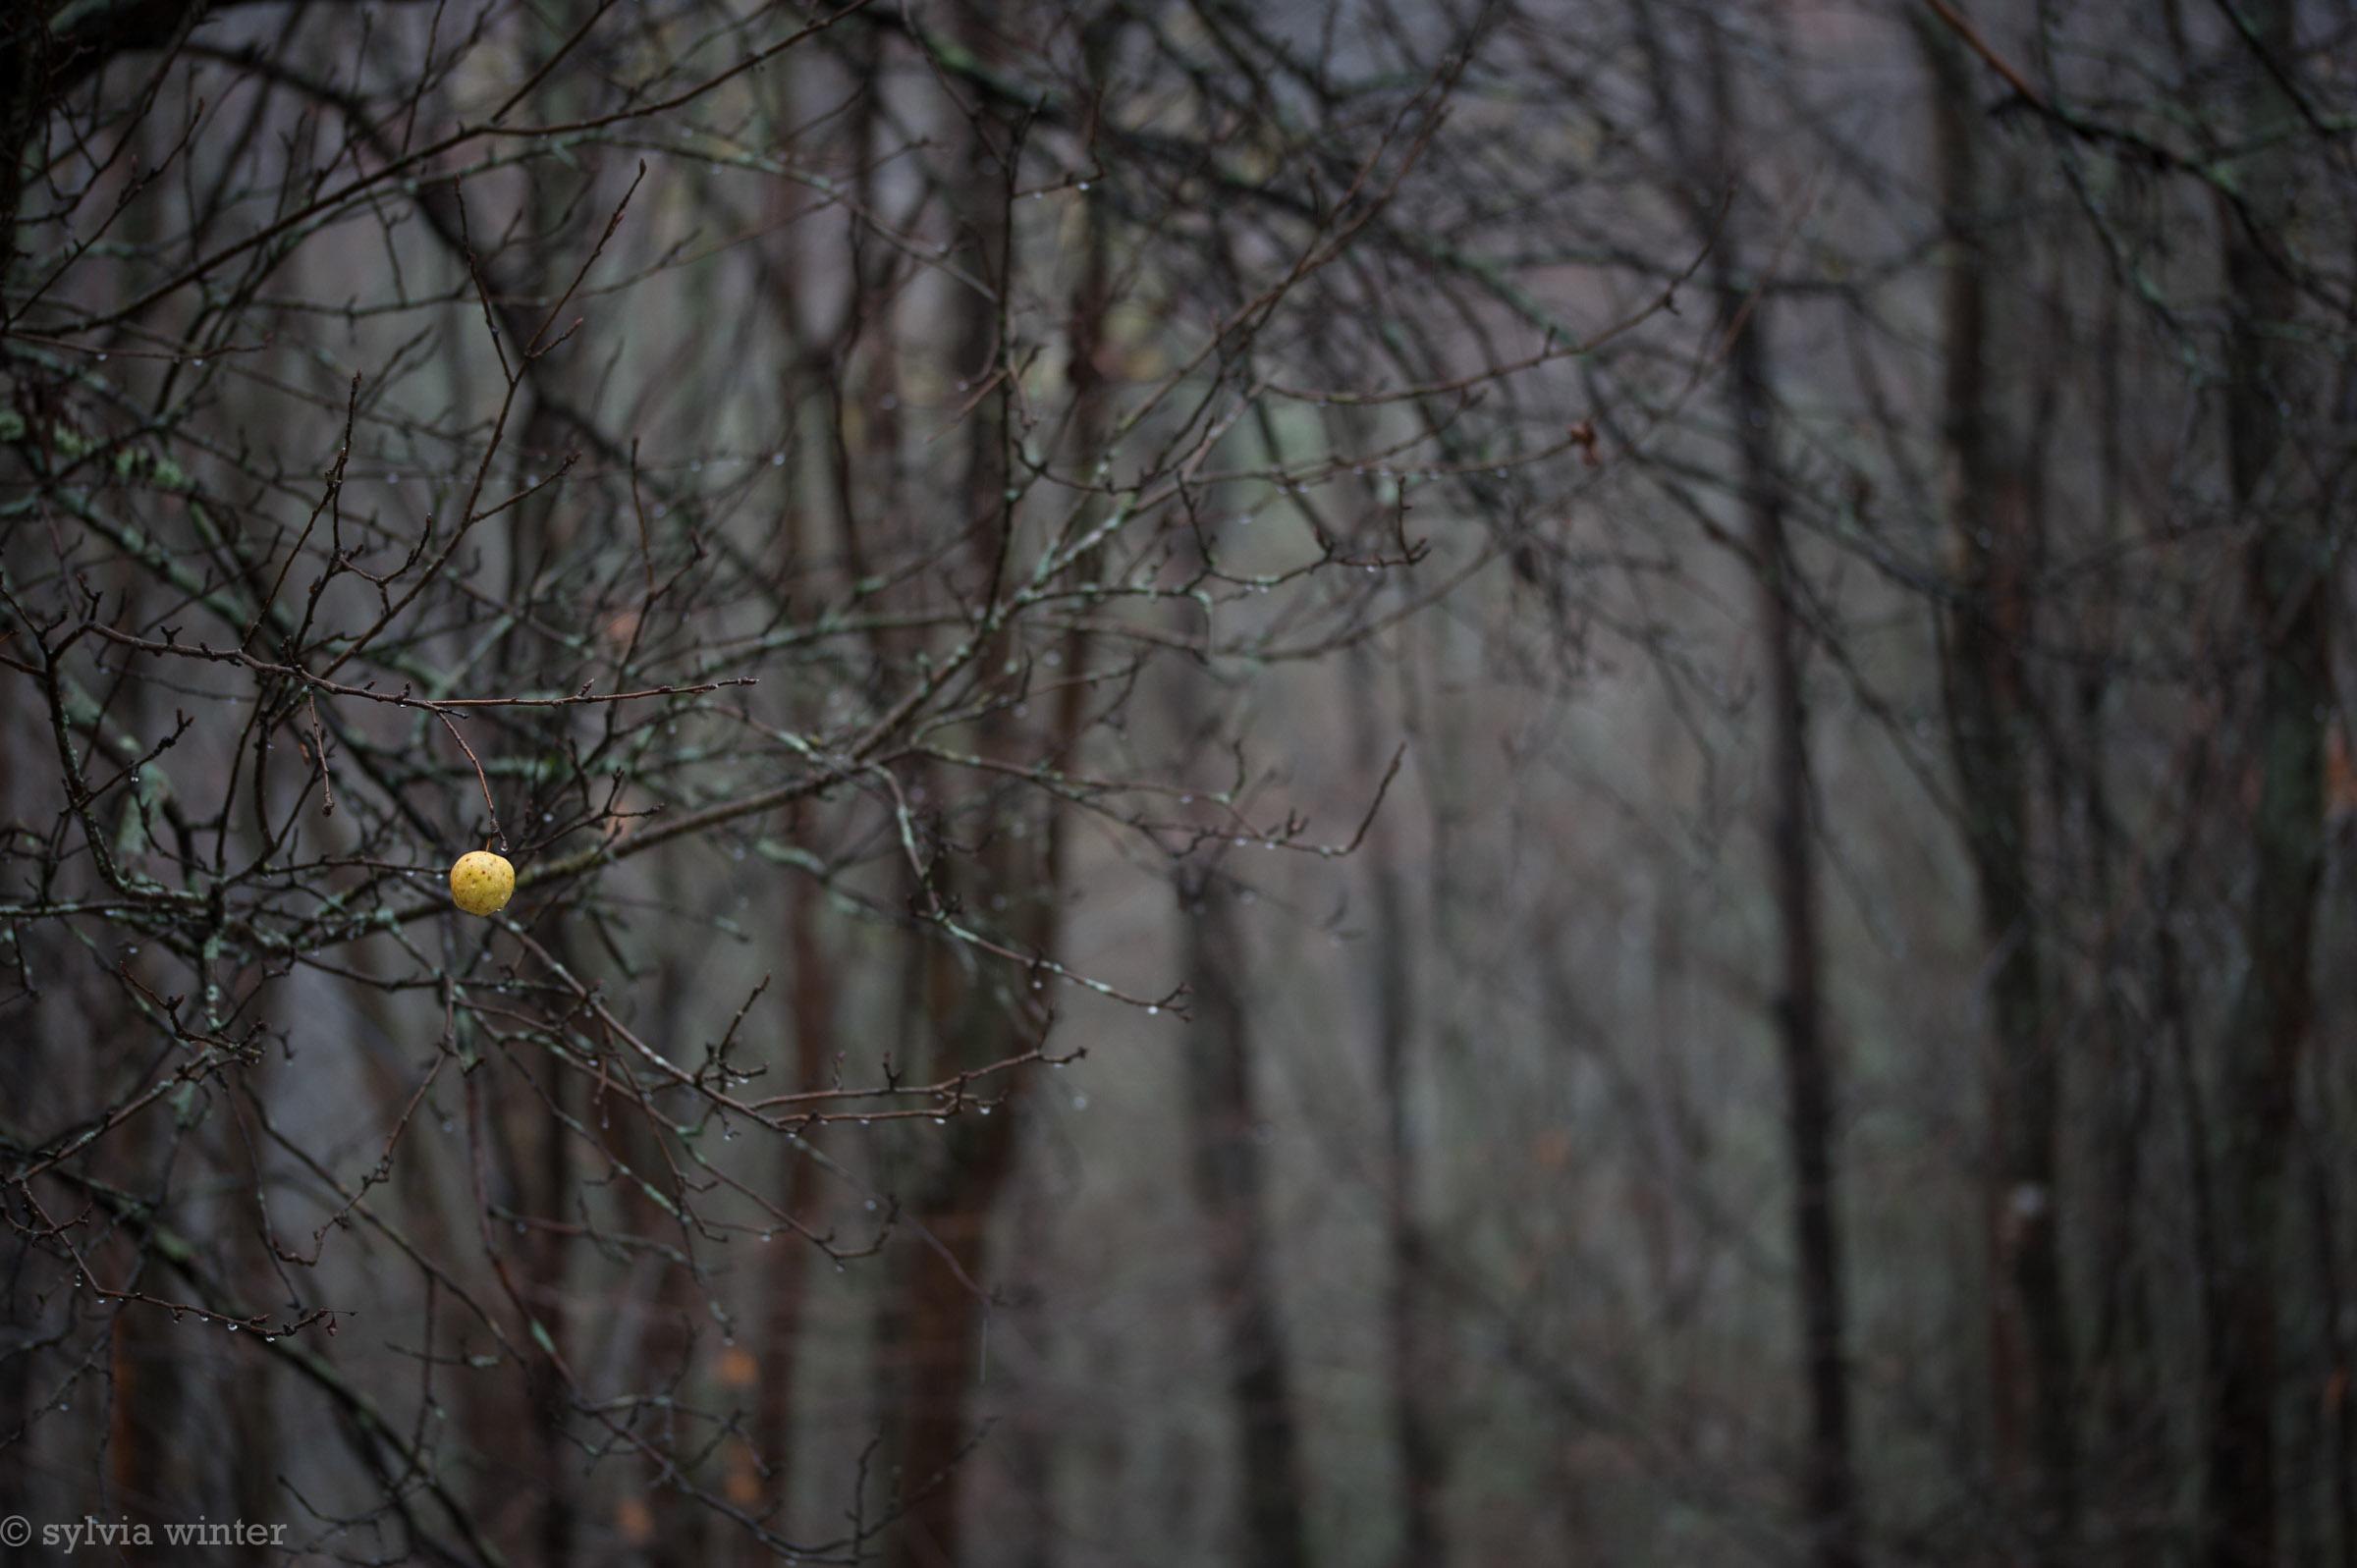 © Sylvia Winter